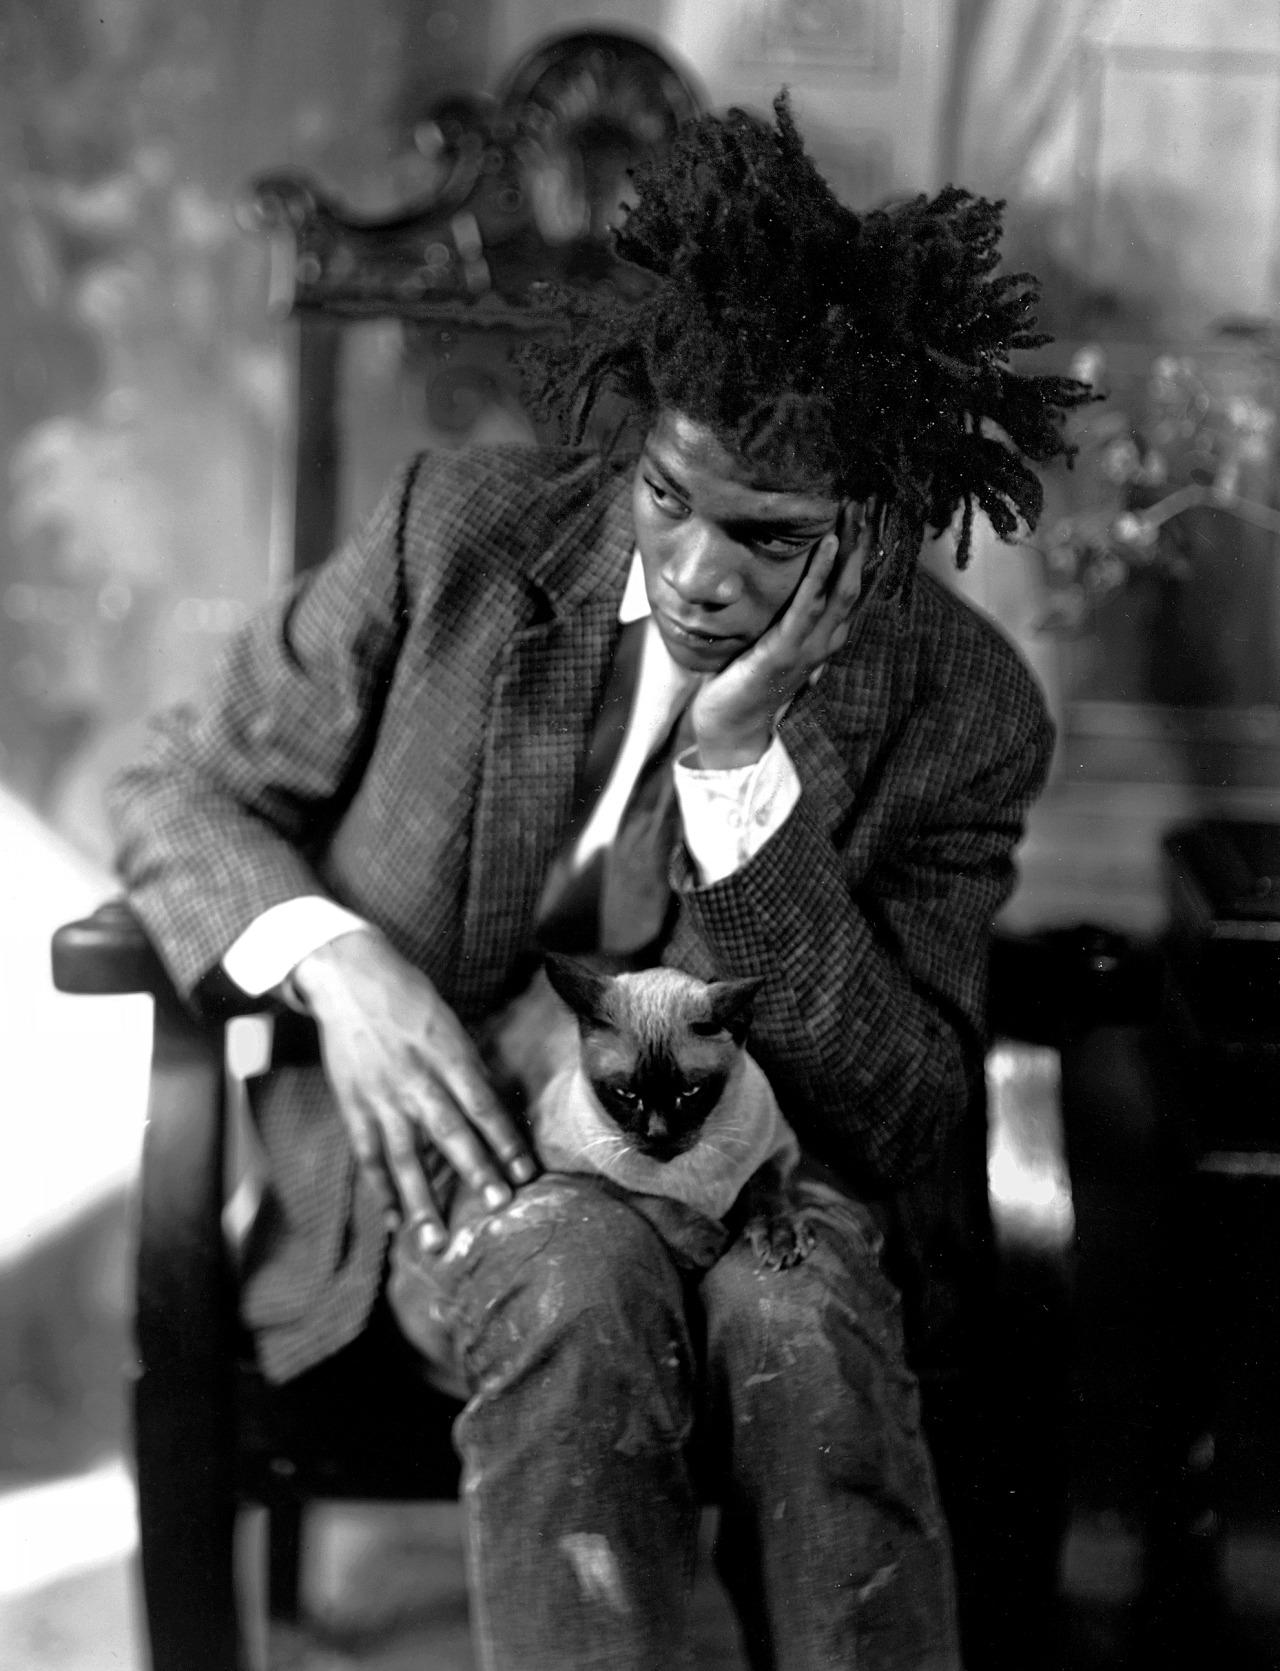 jean-michel basquiat WITH CAT